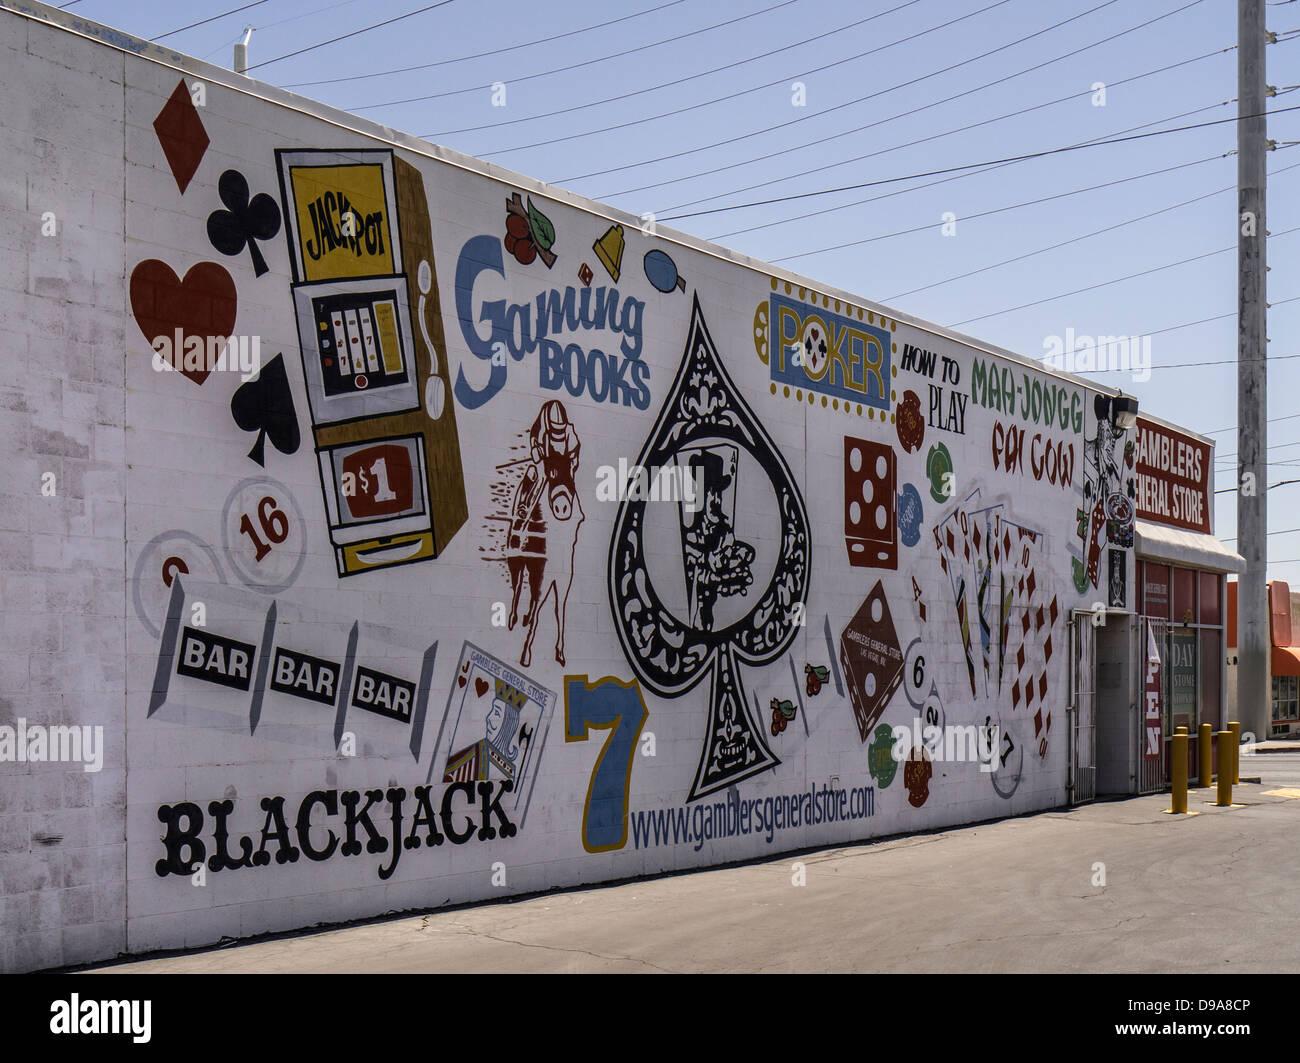 Wall Mural outside Gamblers General Store in Downtown Las Vegas